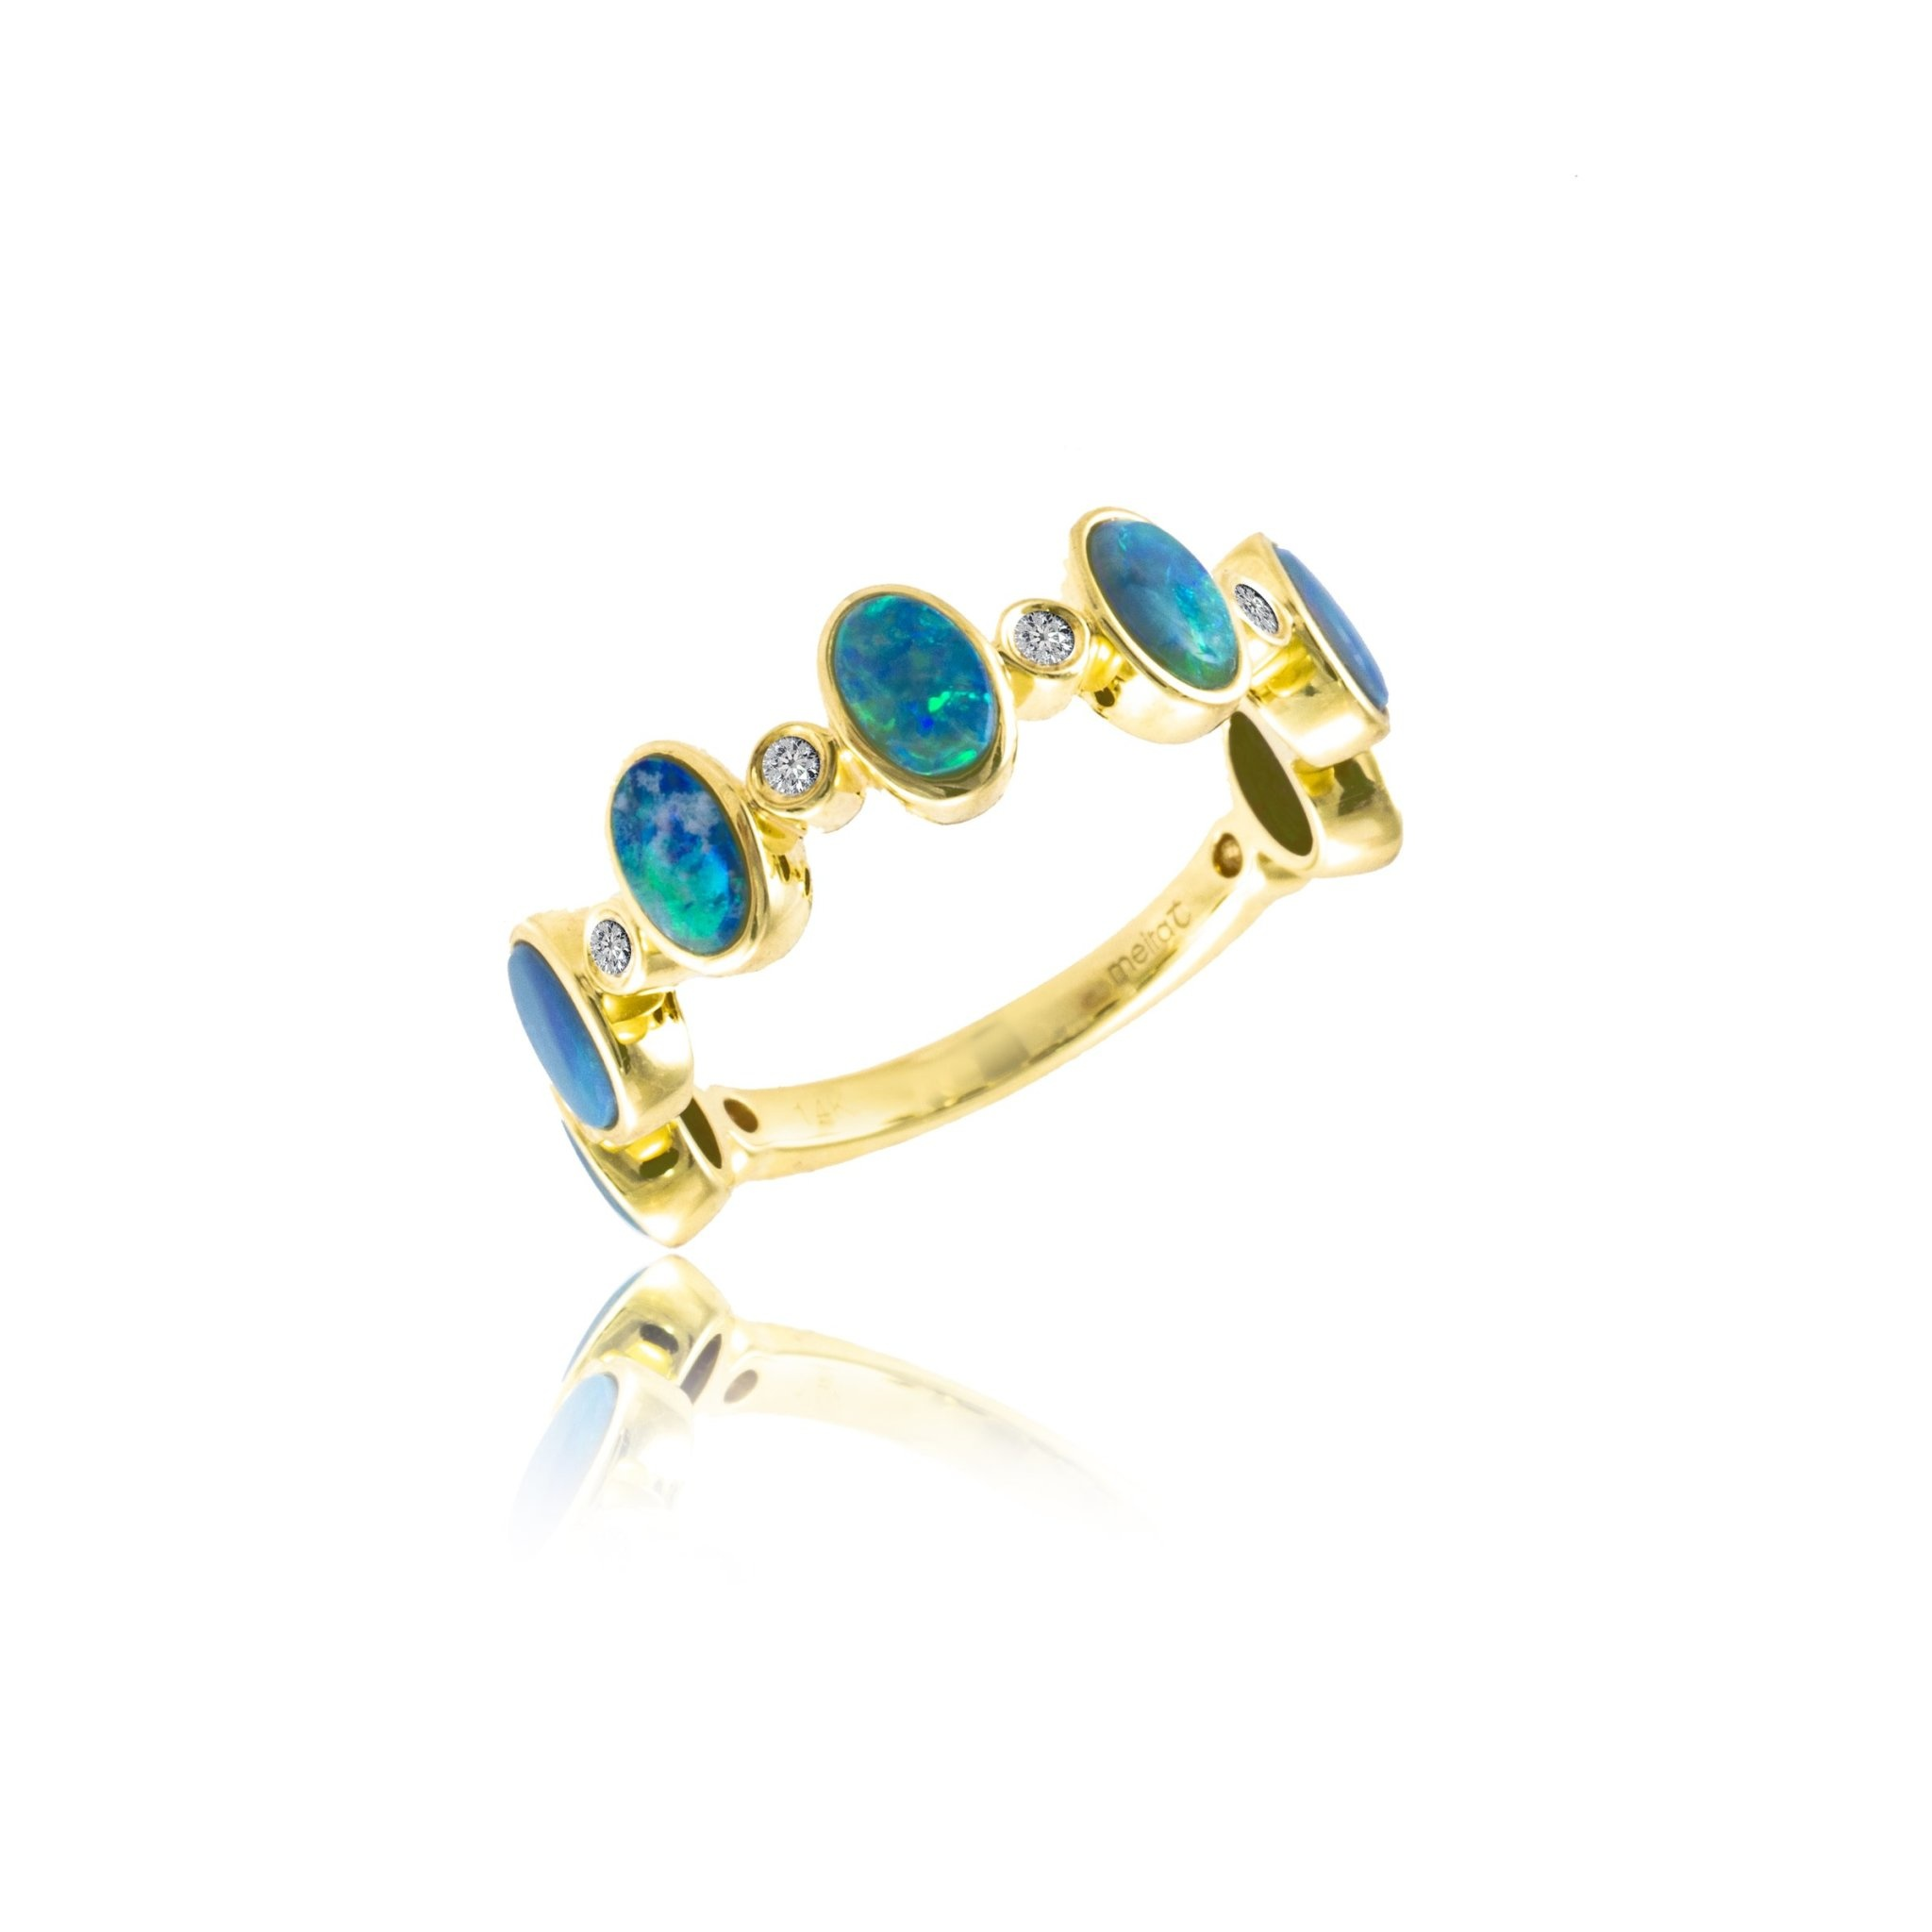 Meira T 14kt Yellow Gold Opal Half Band